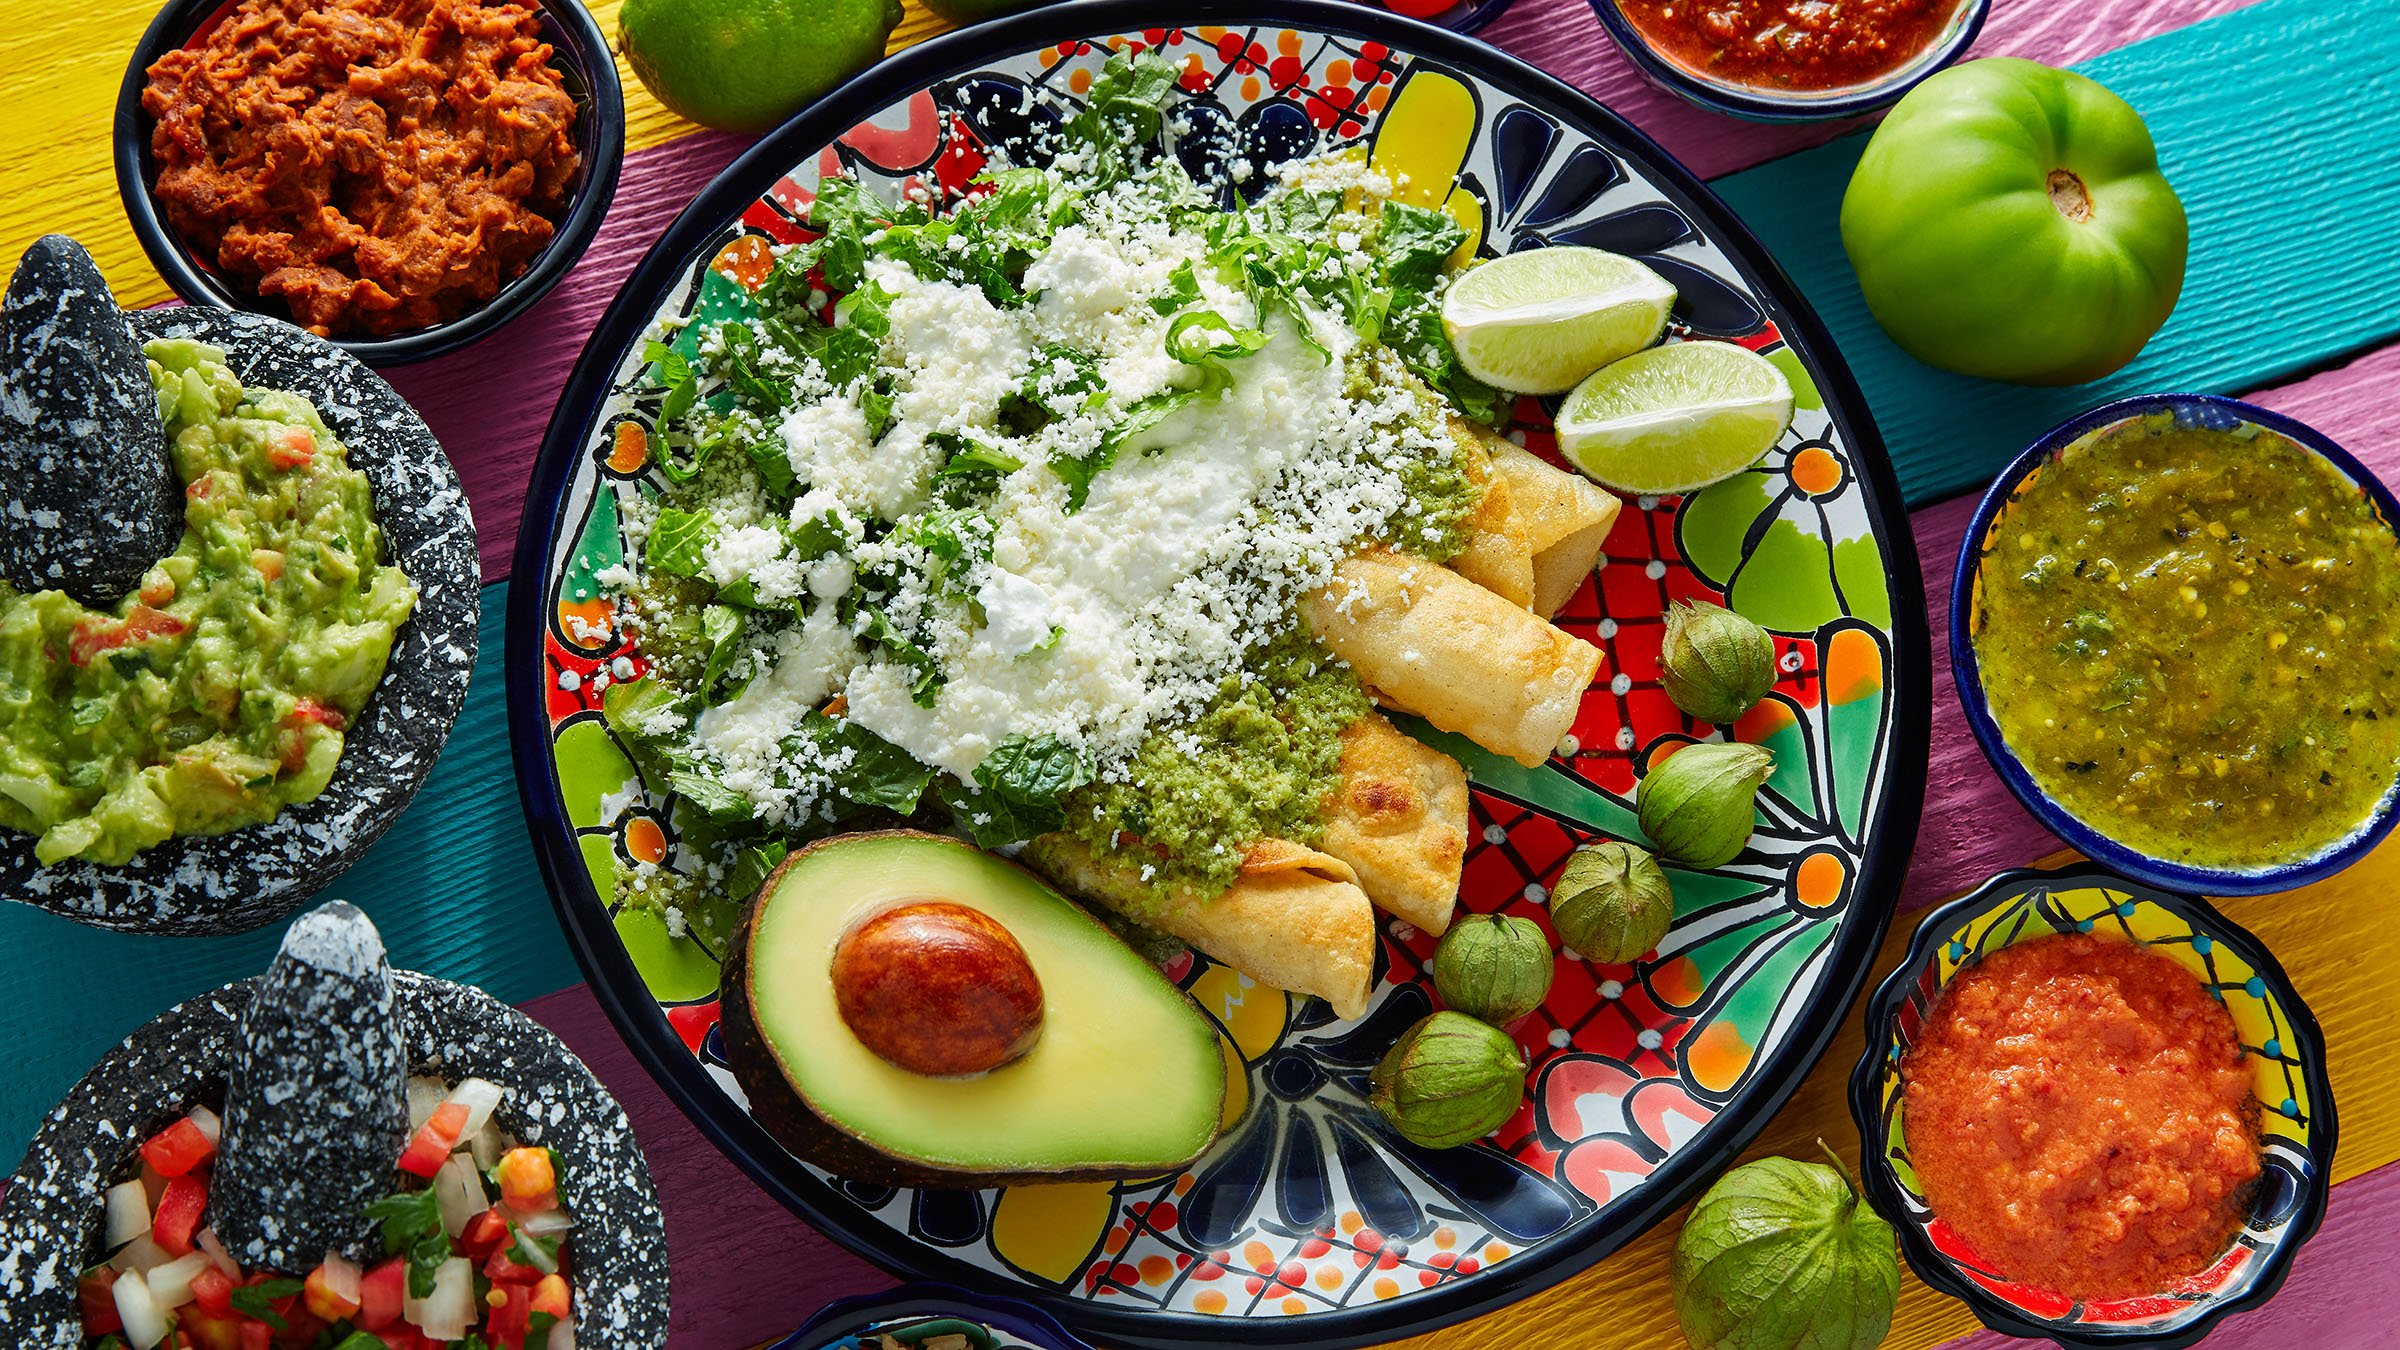 Comida típica de México: la enchilada